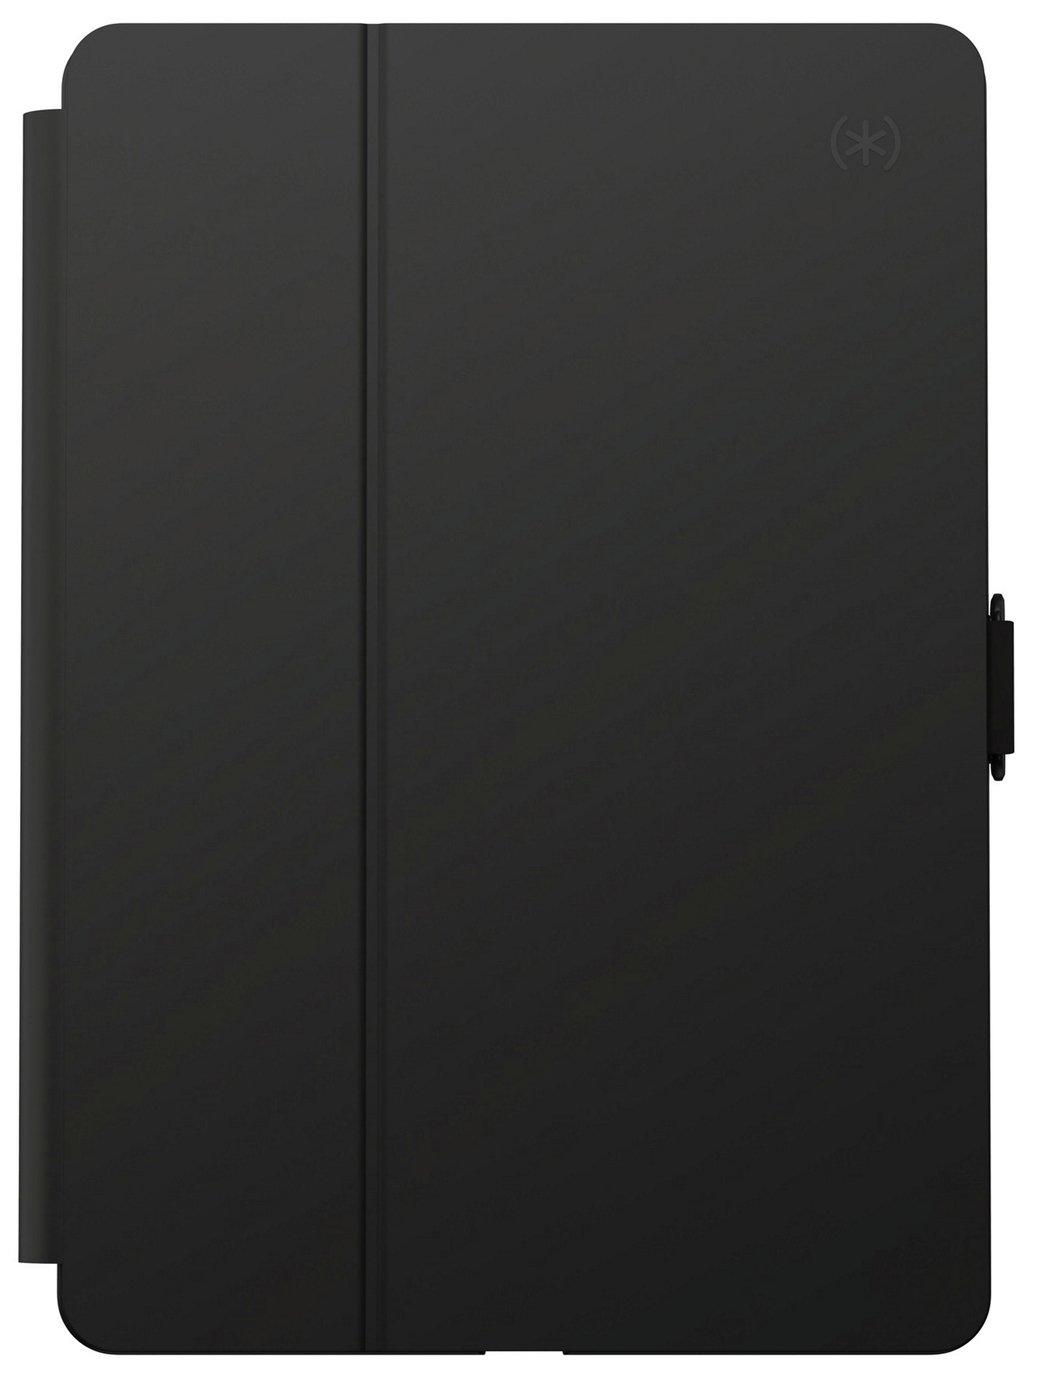 Speck Balance iPad 10.2 Inch Folio Tablet Case - Black